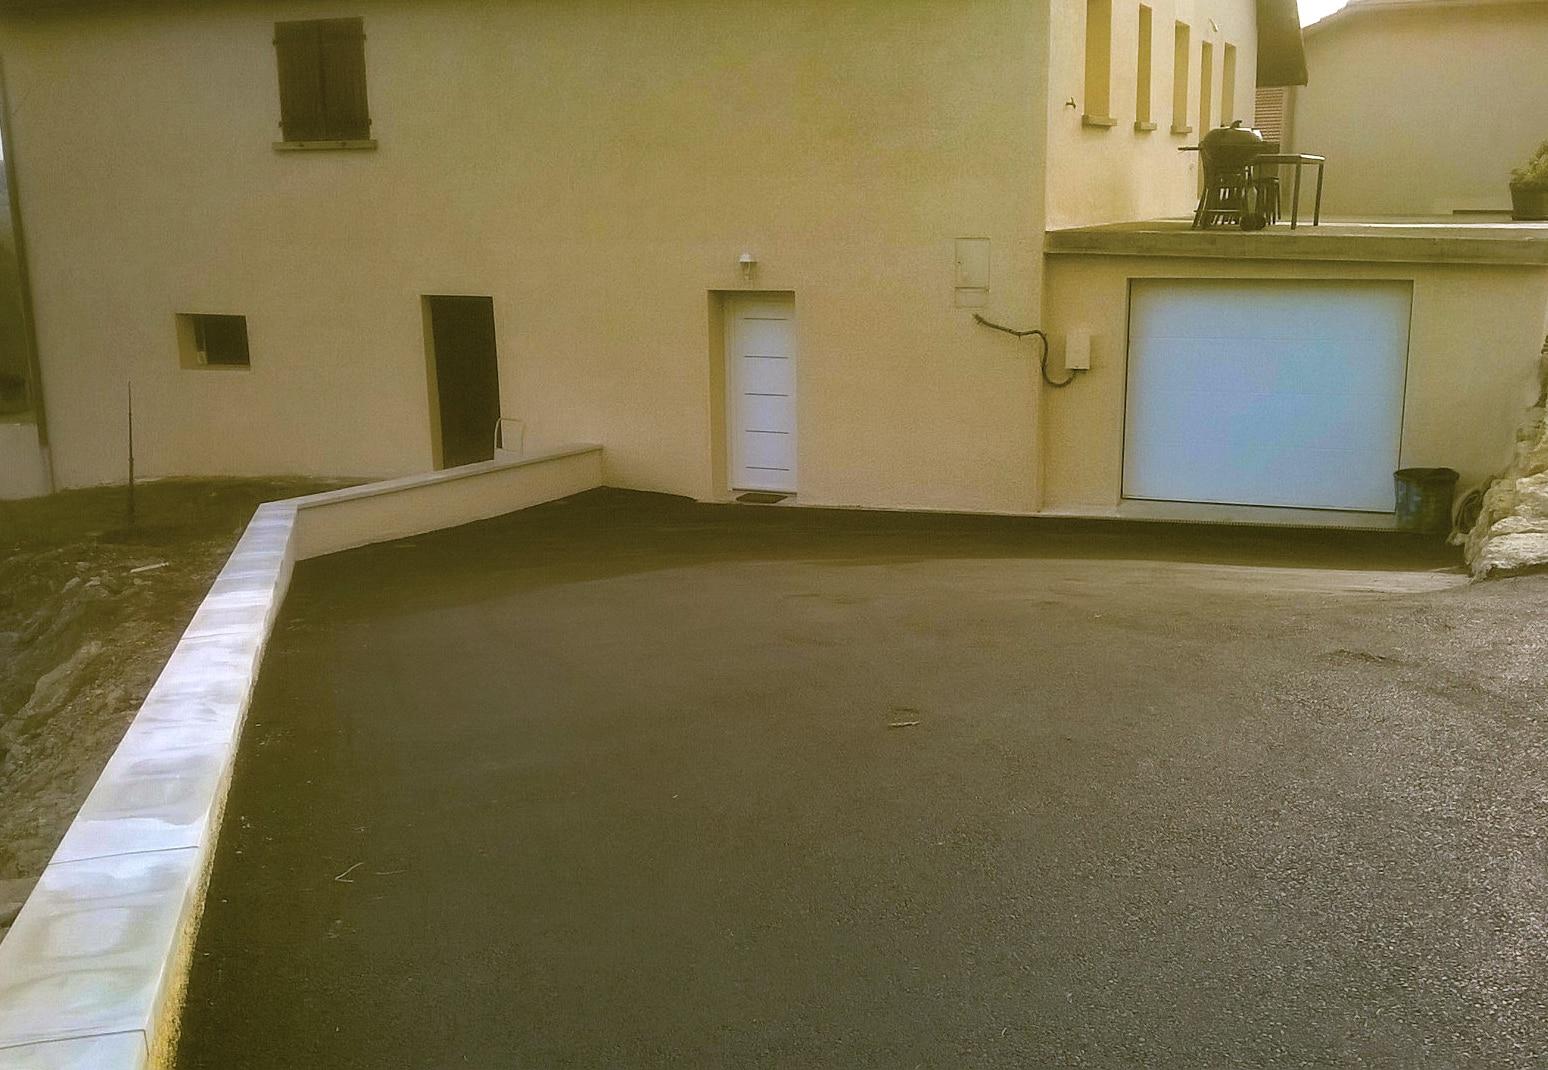 Pose porte garage et creation pente Bourgoin